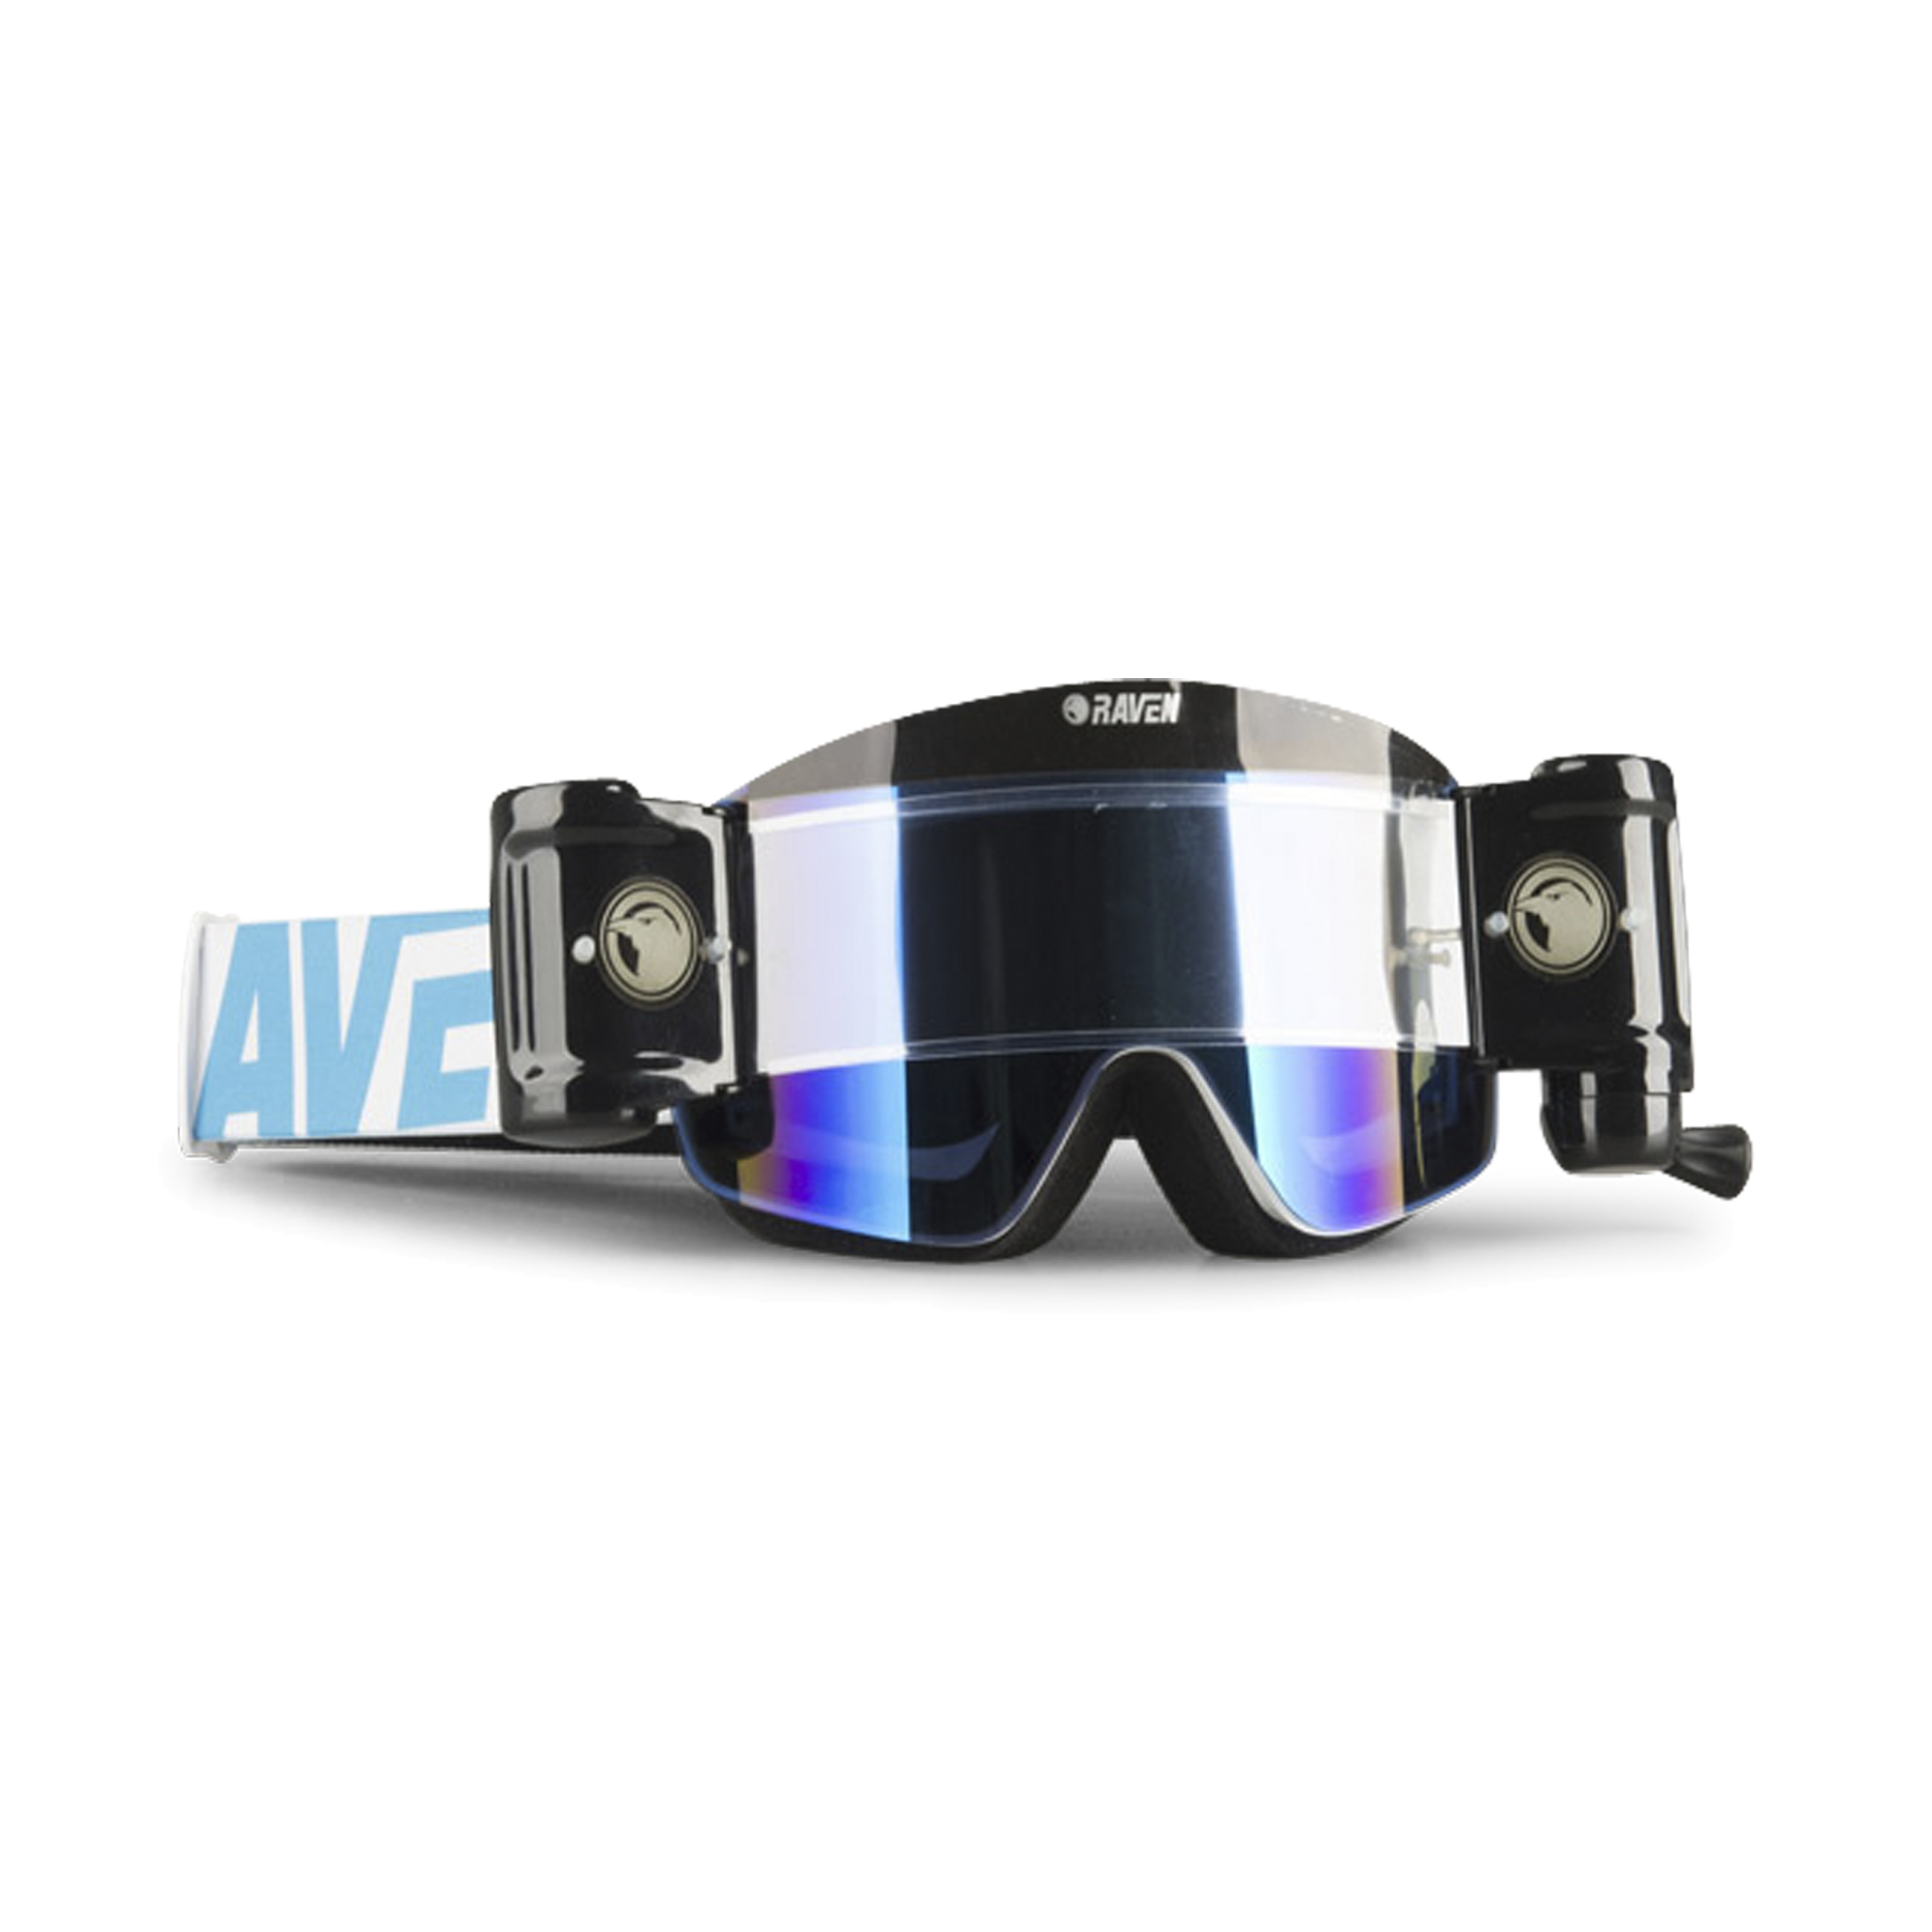 Pellicola a Colori Montatura Nera ROSEBEAR Maschera da Moto Motocross Maschera off Road MX ATV Dirt Bike Occhiali Occhiali